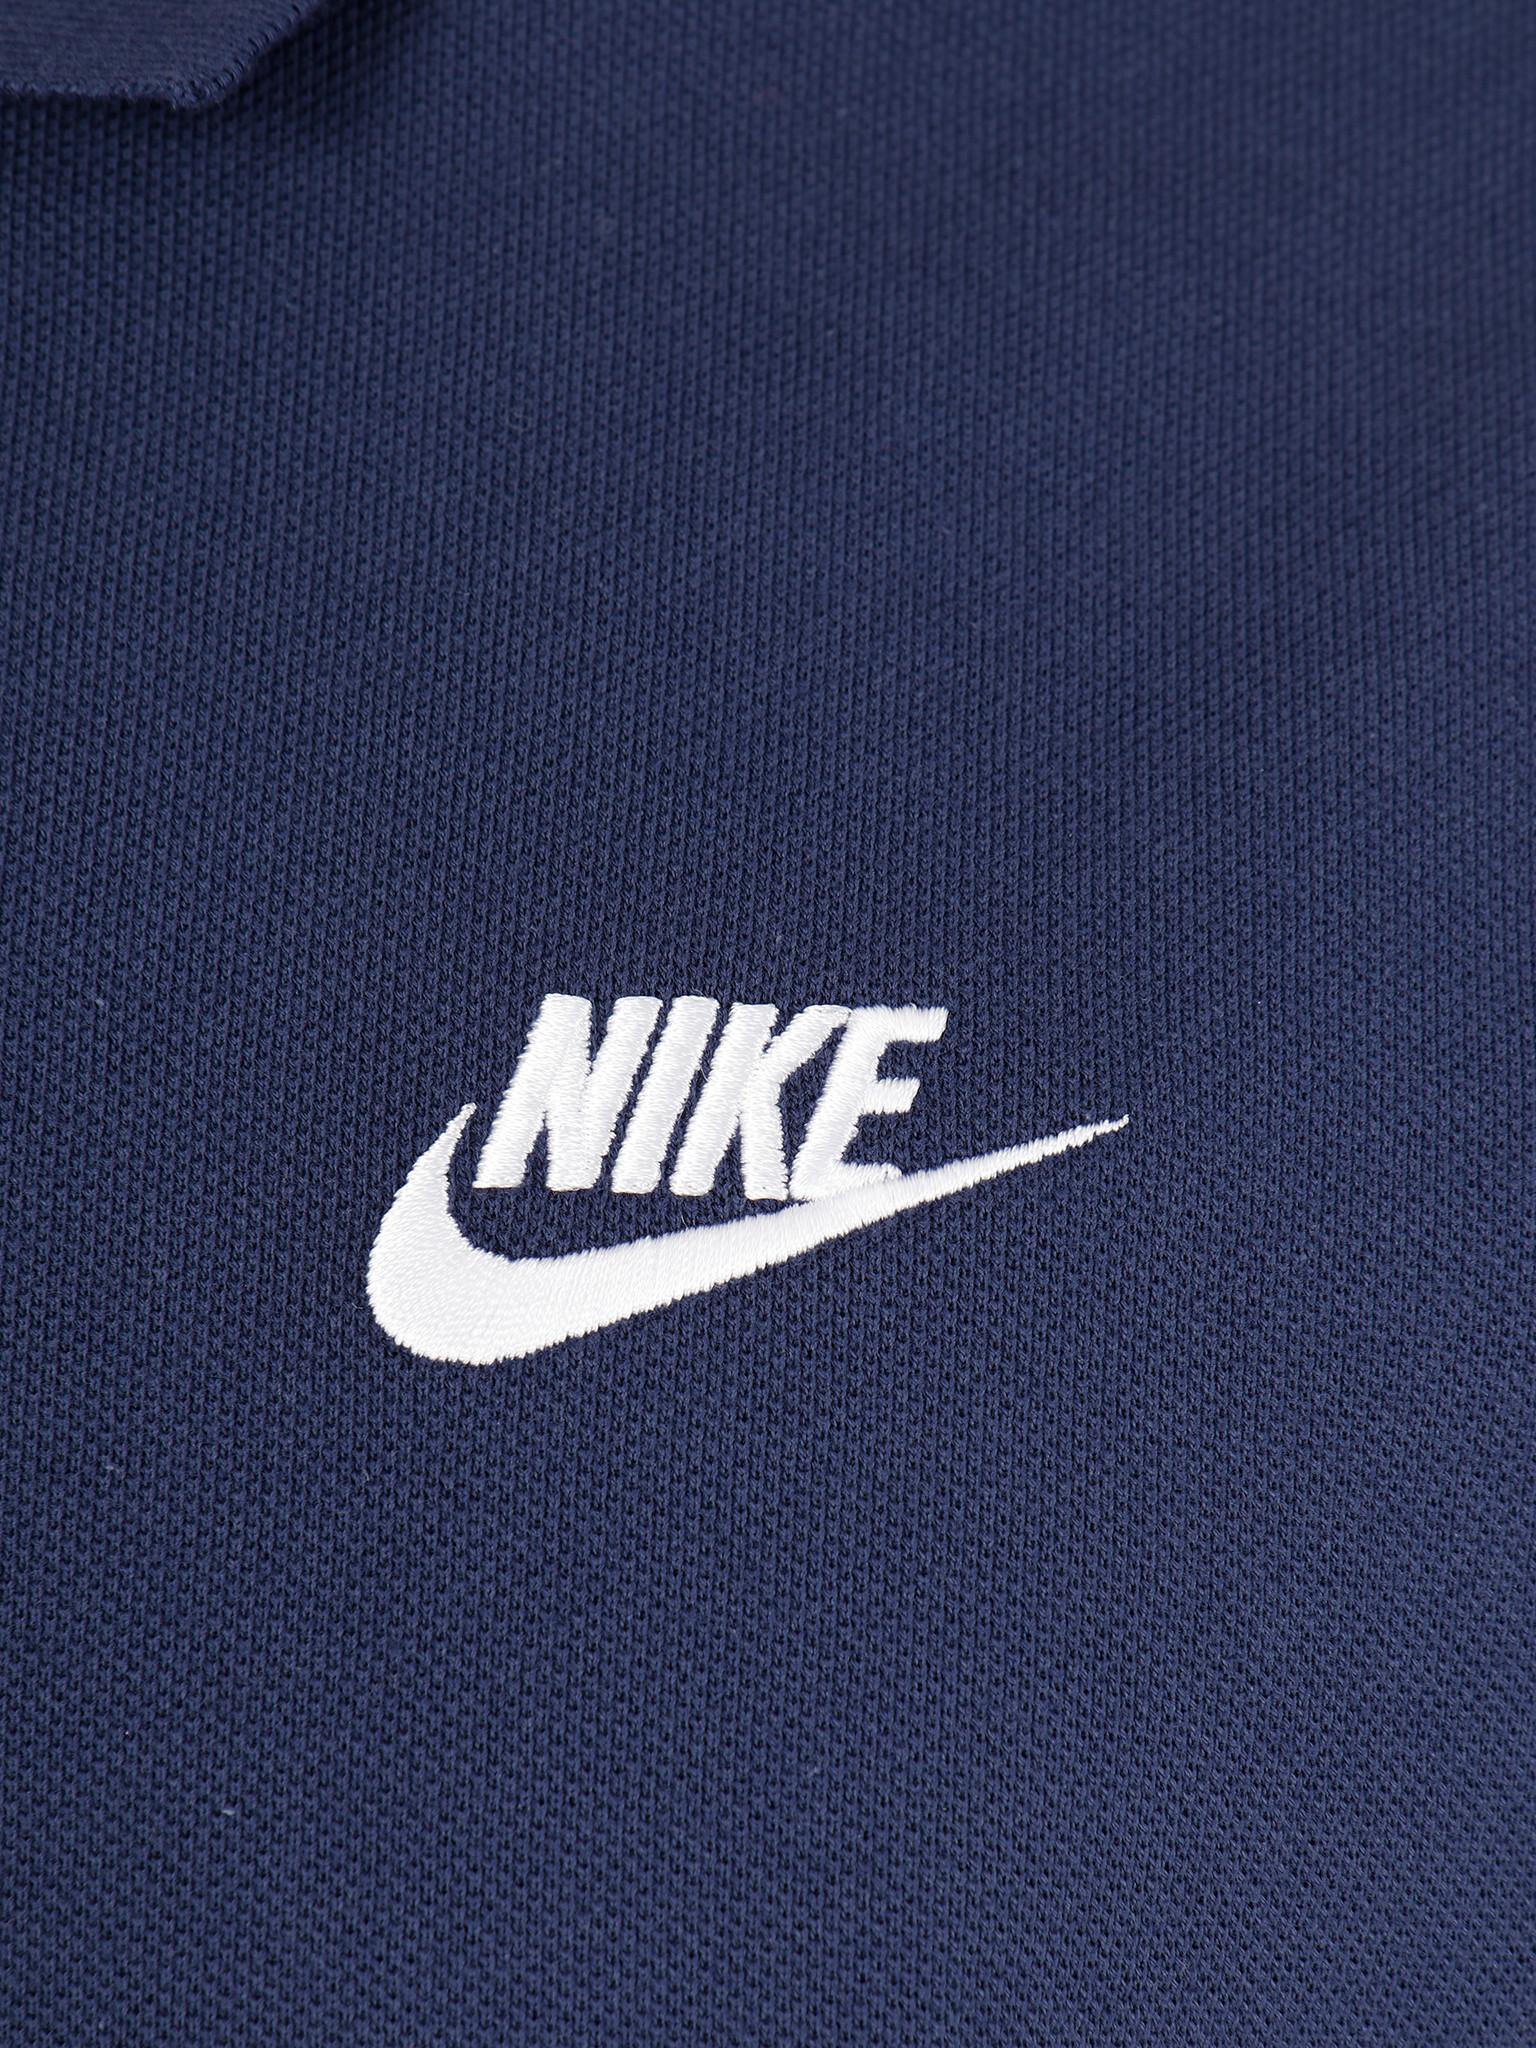 Nike Nike NSW Ce Polo Matchup Pq Midnight Navy White CJ4456-410